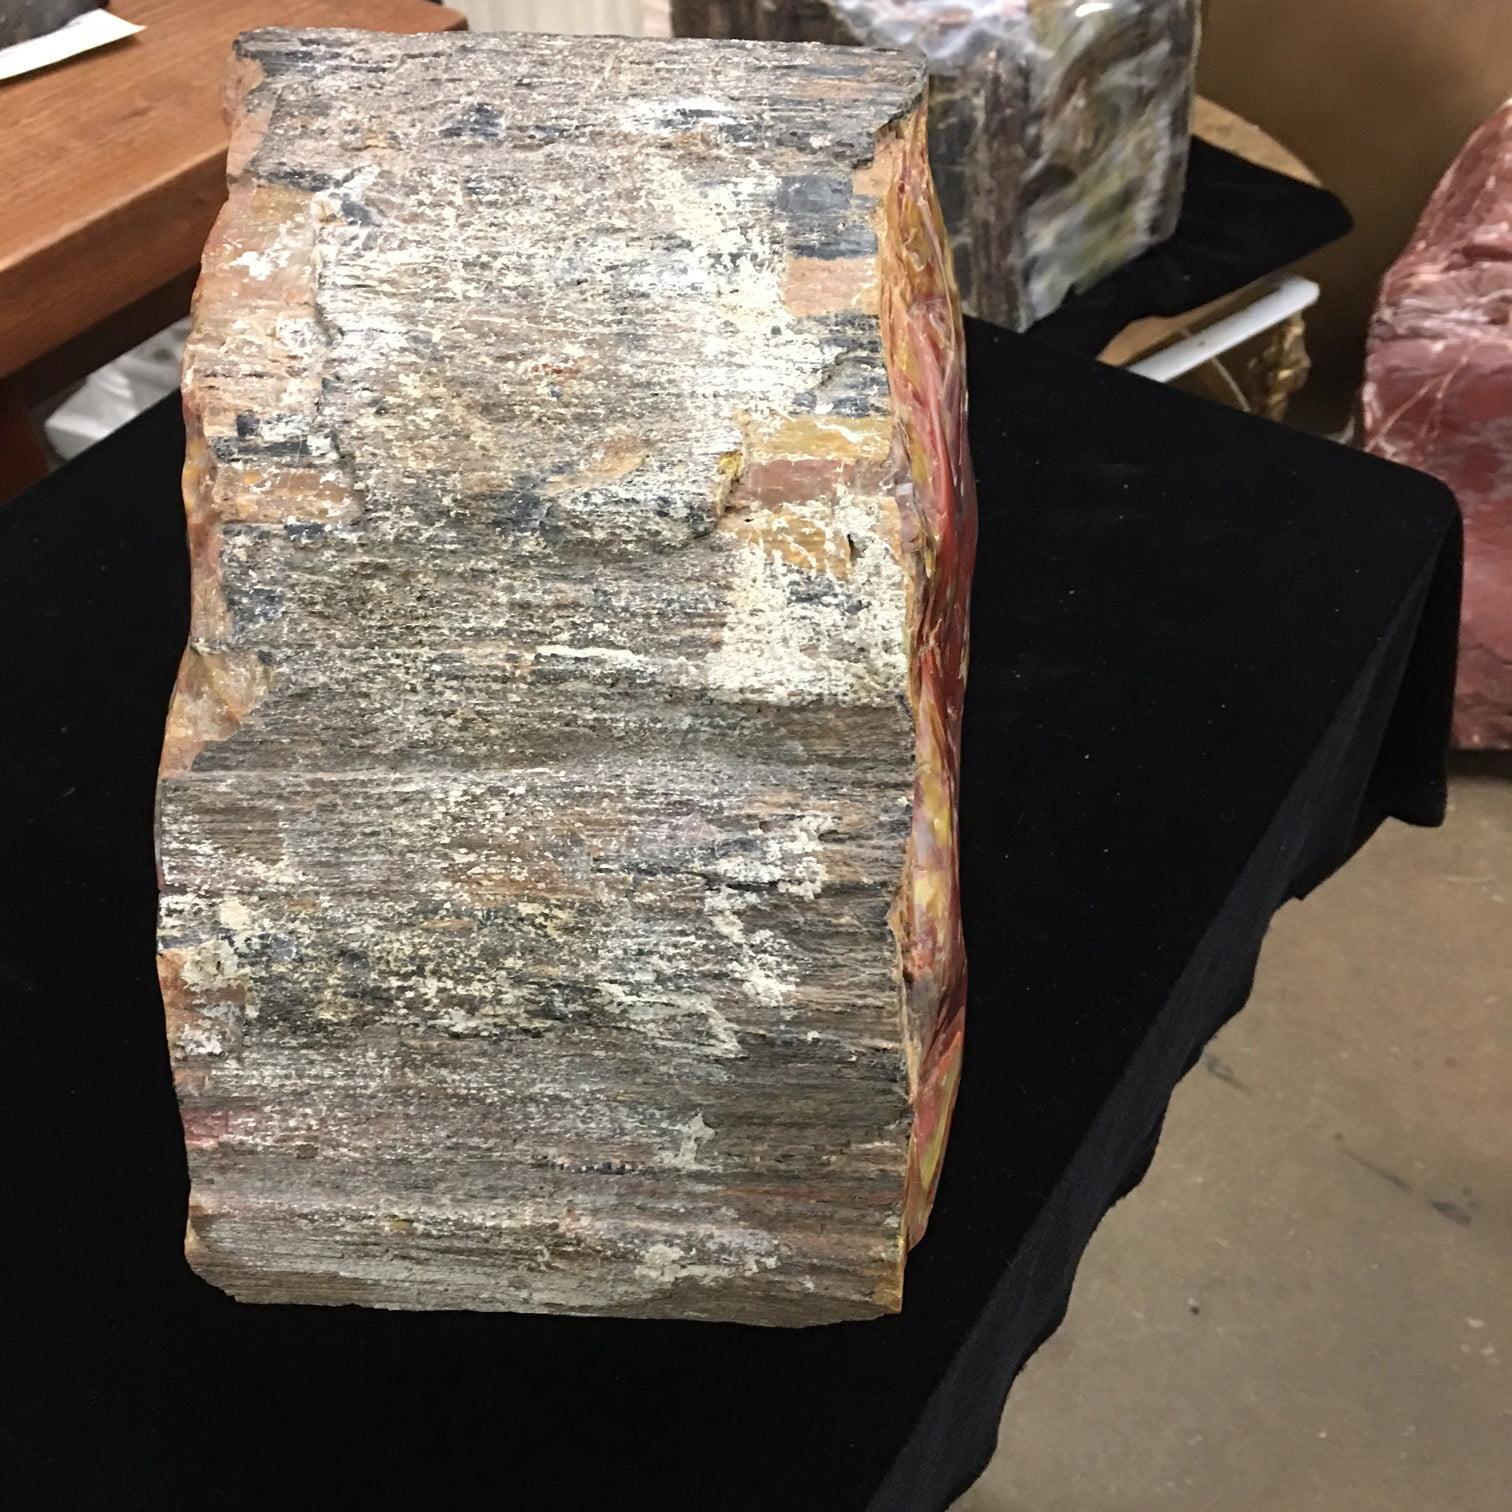 #A9 Museum Arizona Petrified Wood Sculpture Hand Polished On Both Sides – 54 Lbs